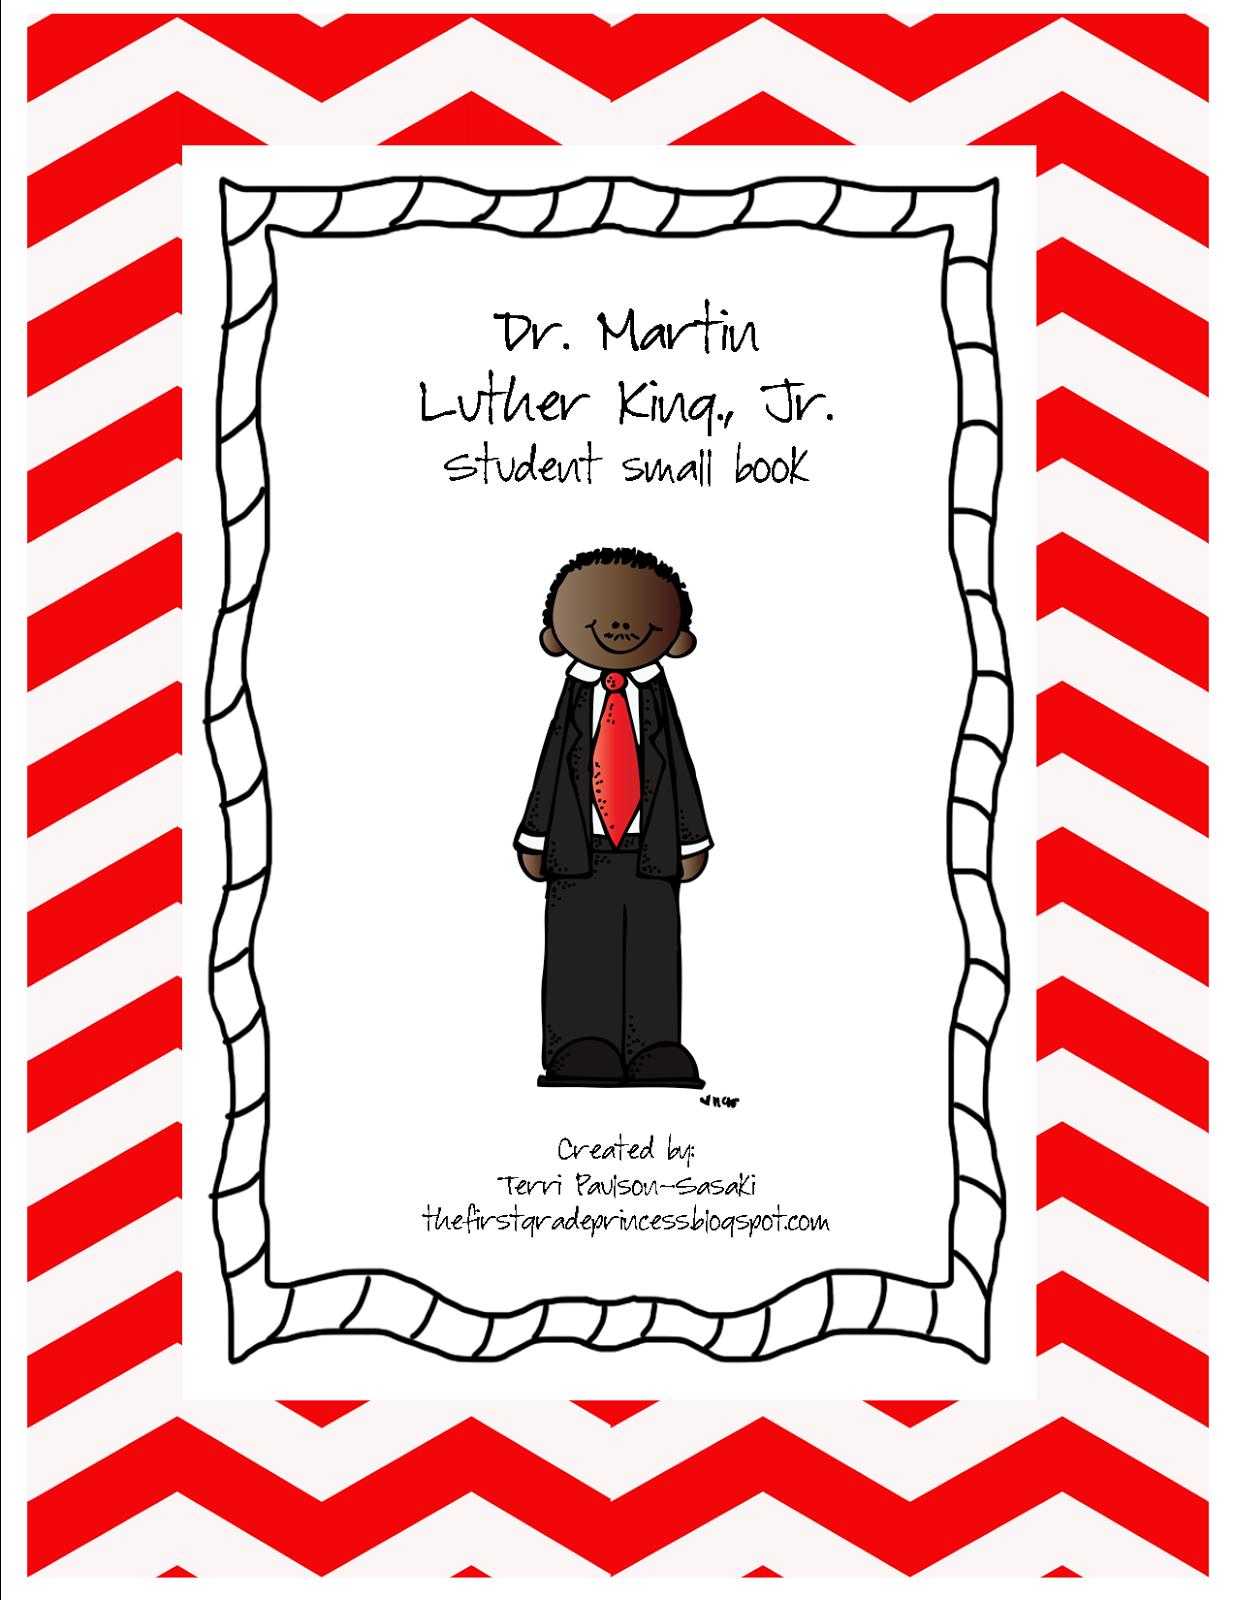 Kinder Princess Martin Luther King Jr